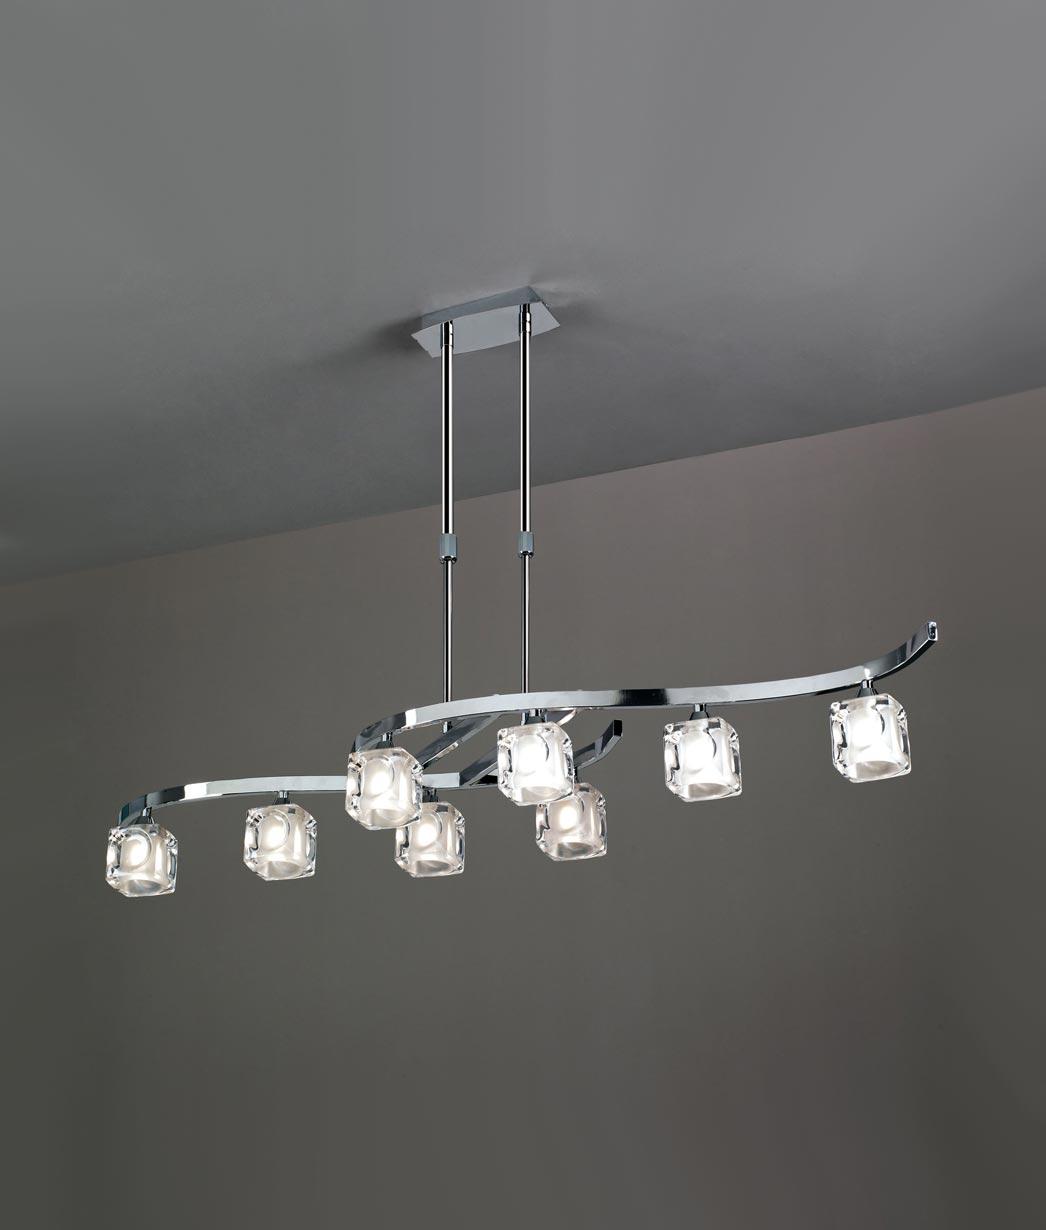 Lámpara grande cromo CUADRAX 8 luces